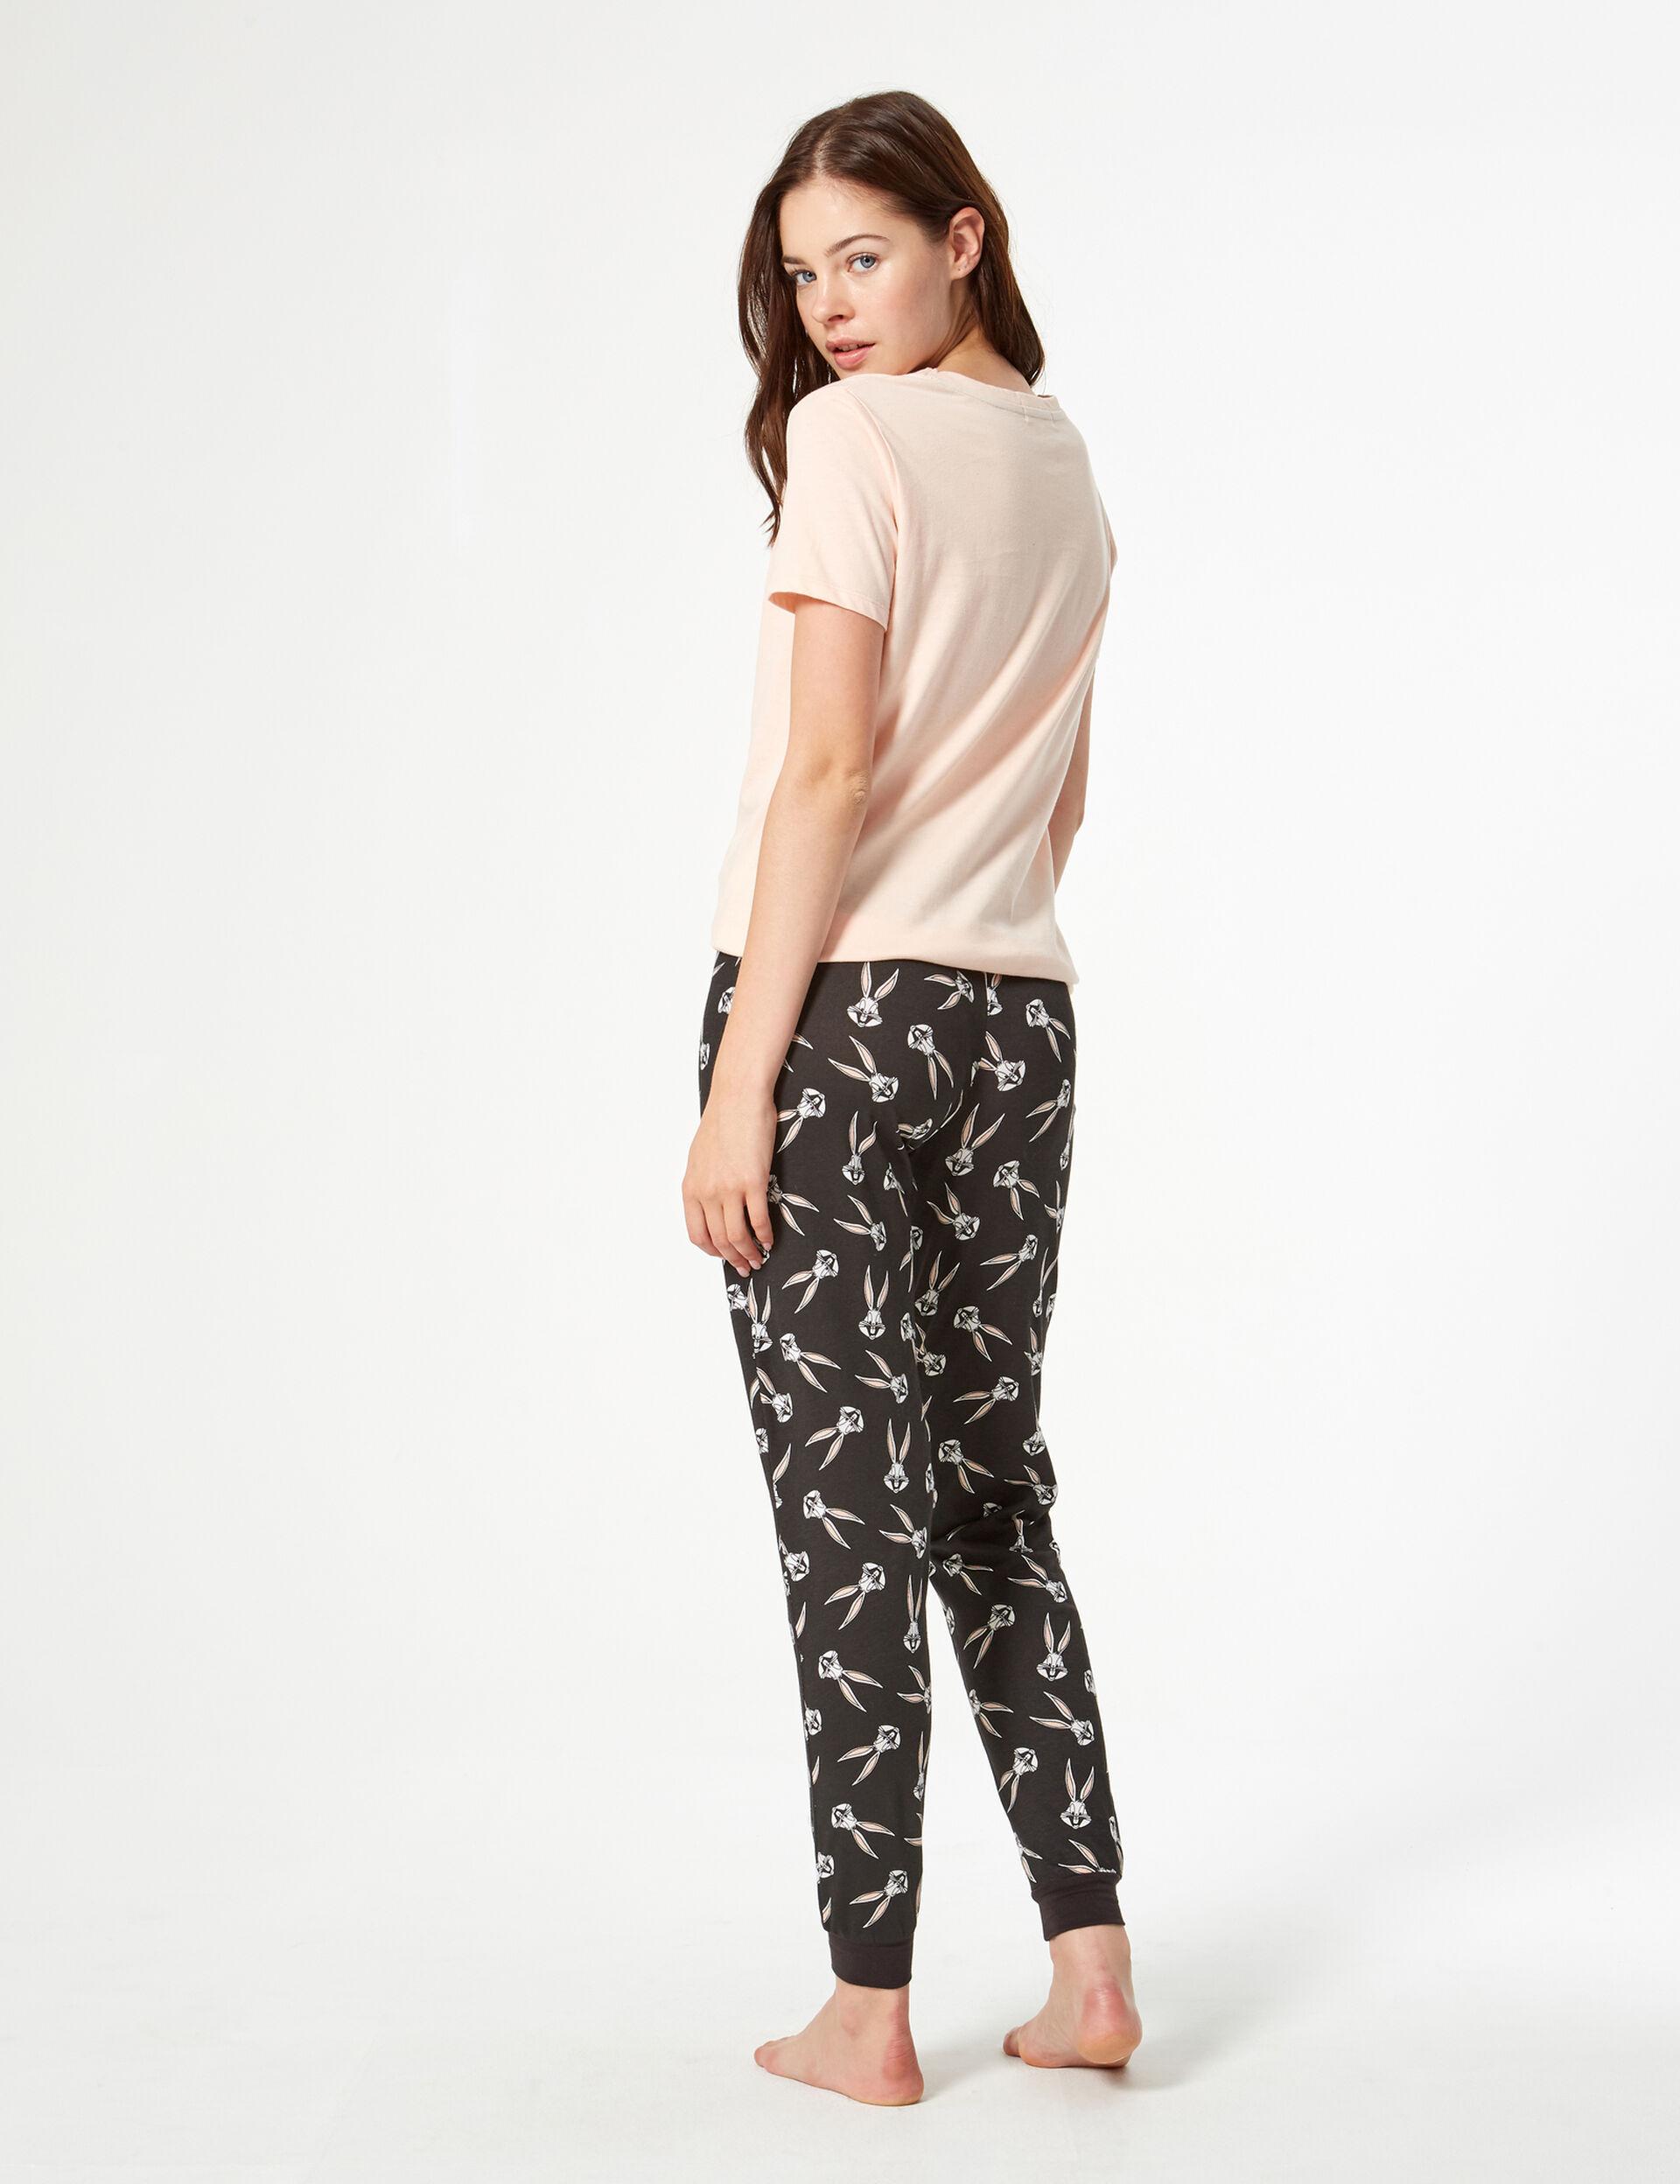 Looney tunes pyjama set